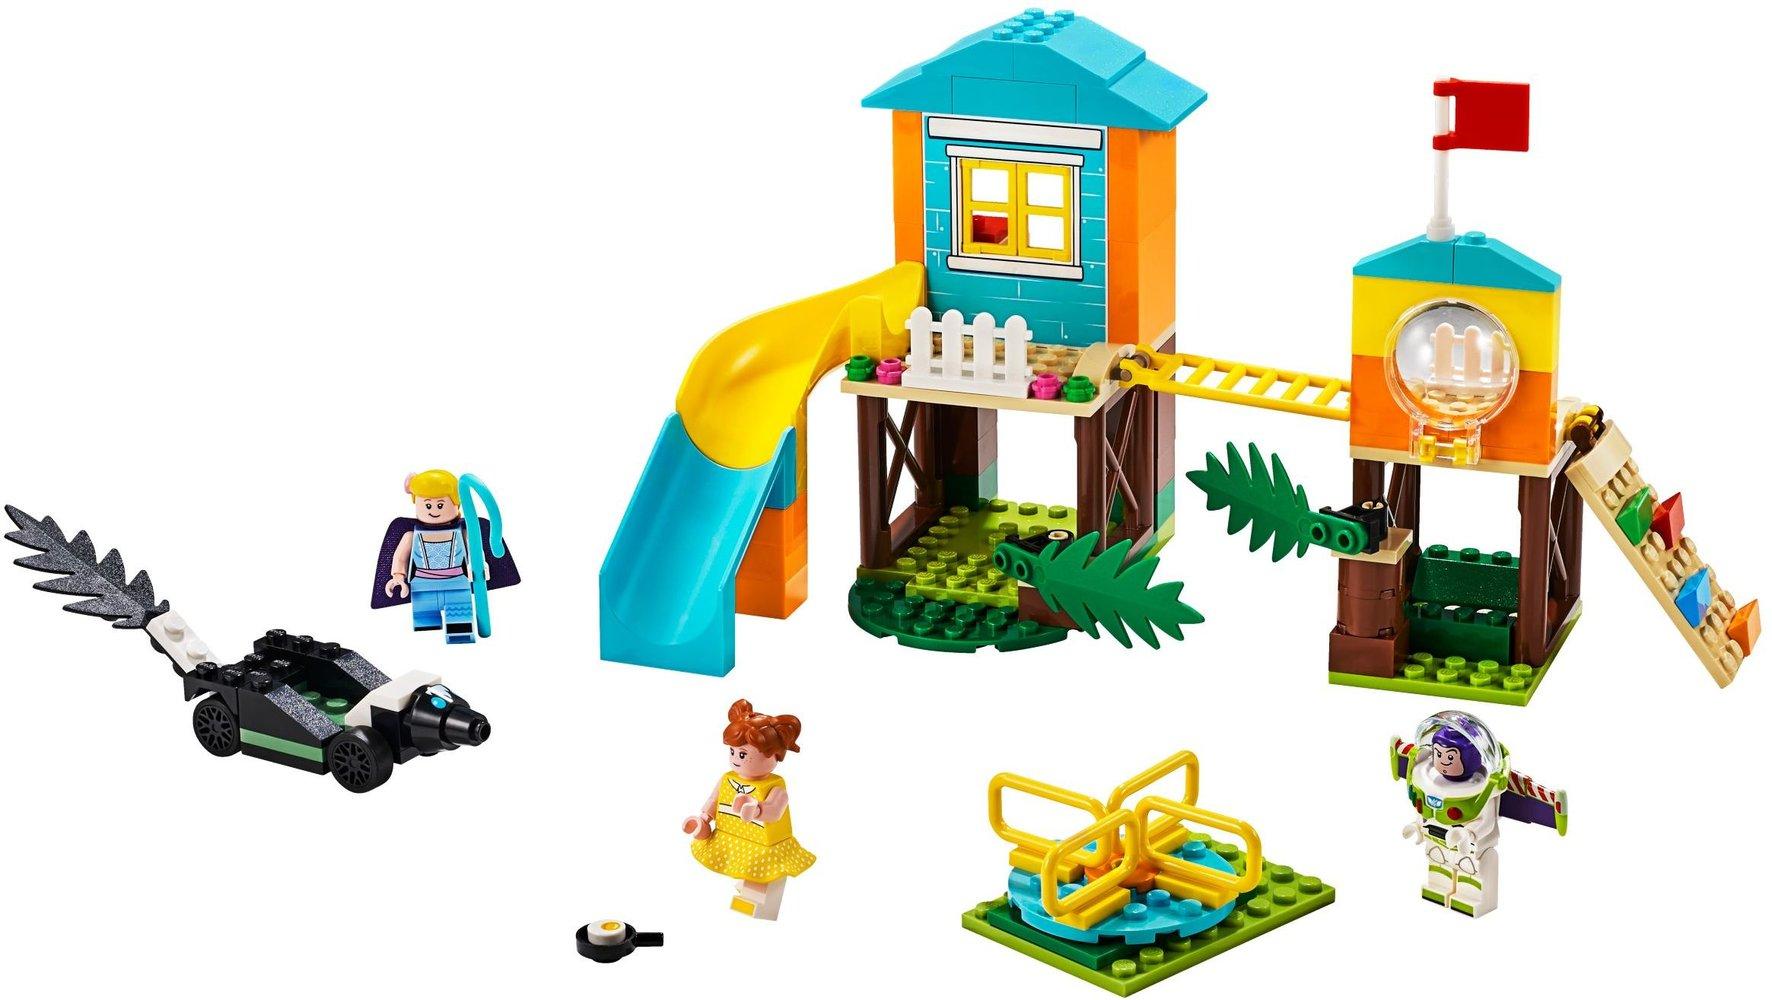 Buzz and Bo Peep's Playground Adventure